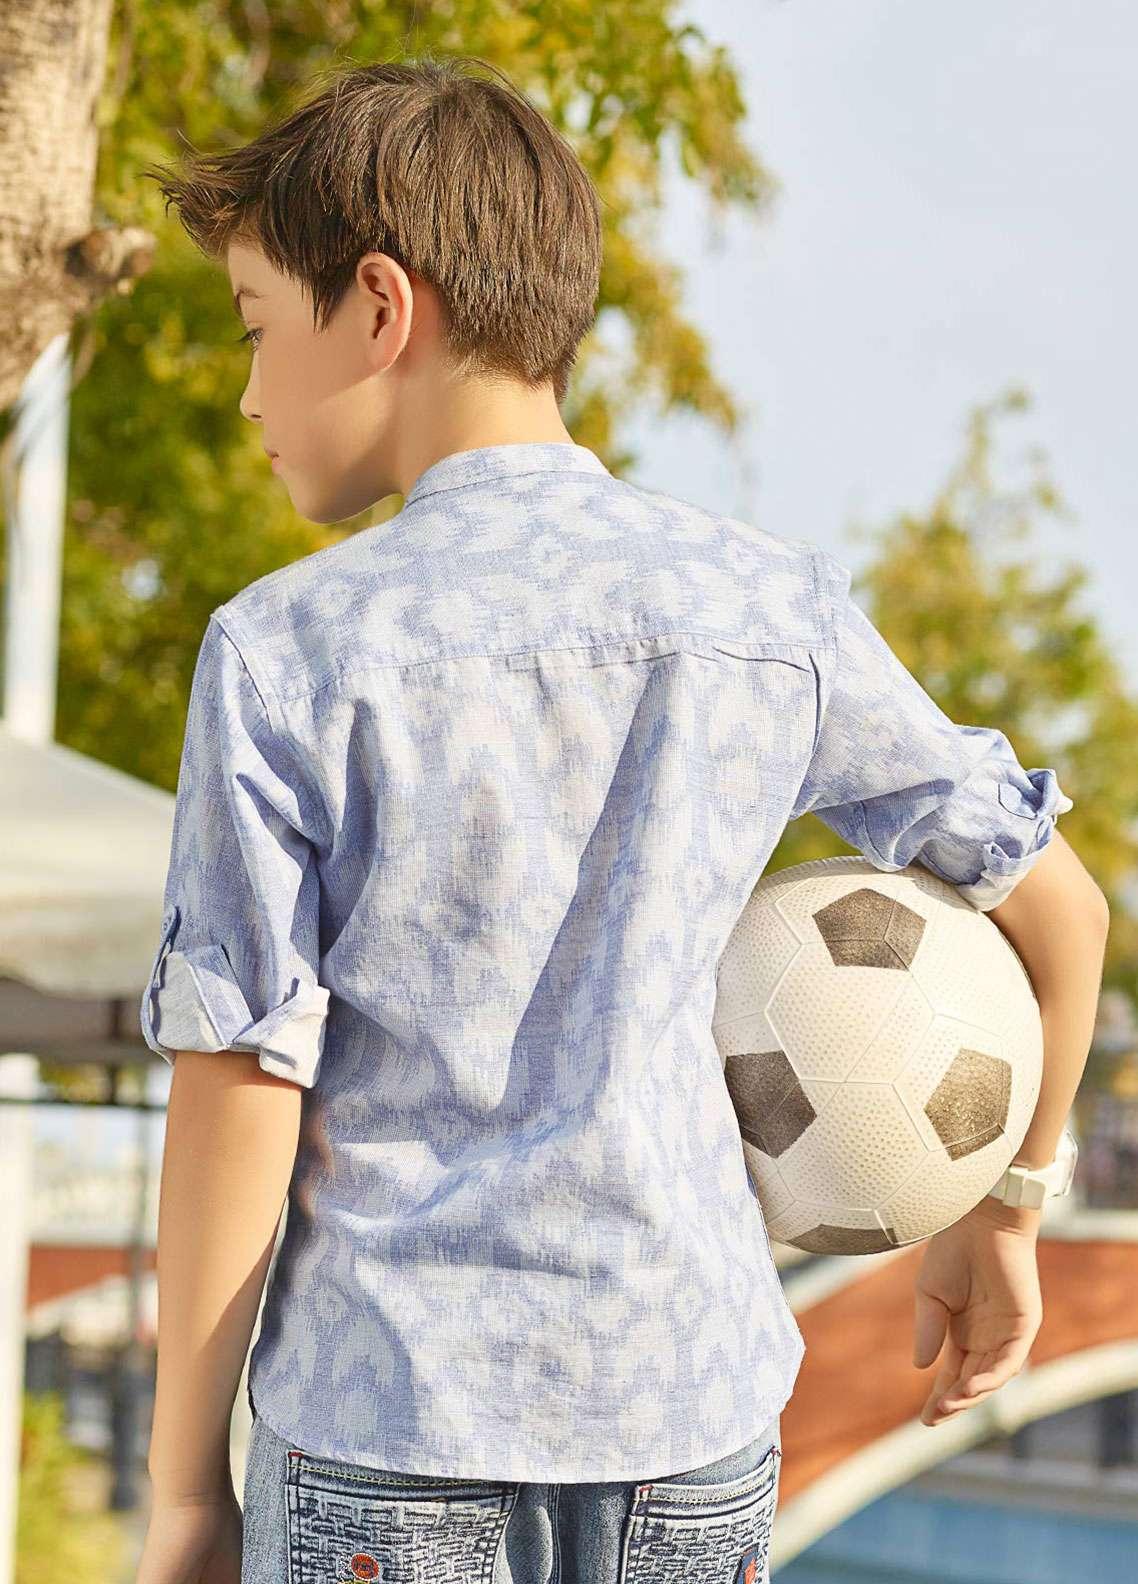 Edenrobe Cotton Casual Boys Shirts - Light Blue EBT3Q19-27218